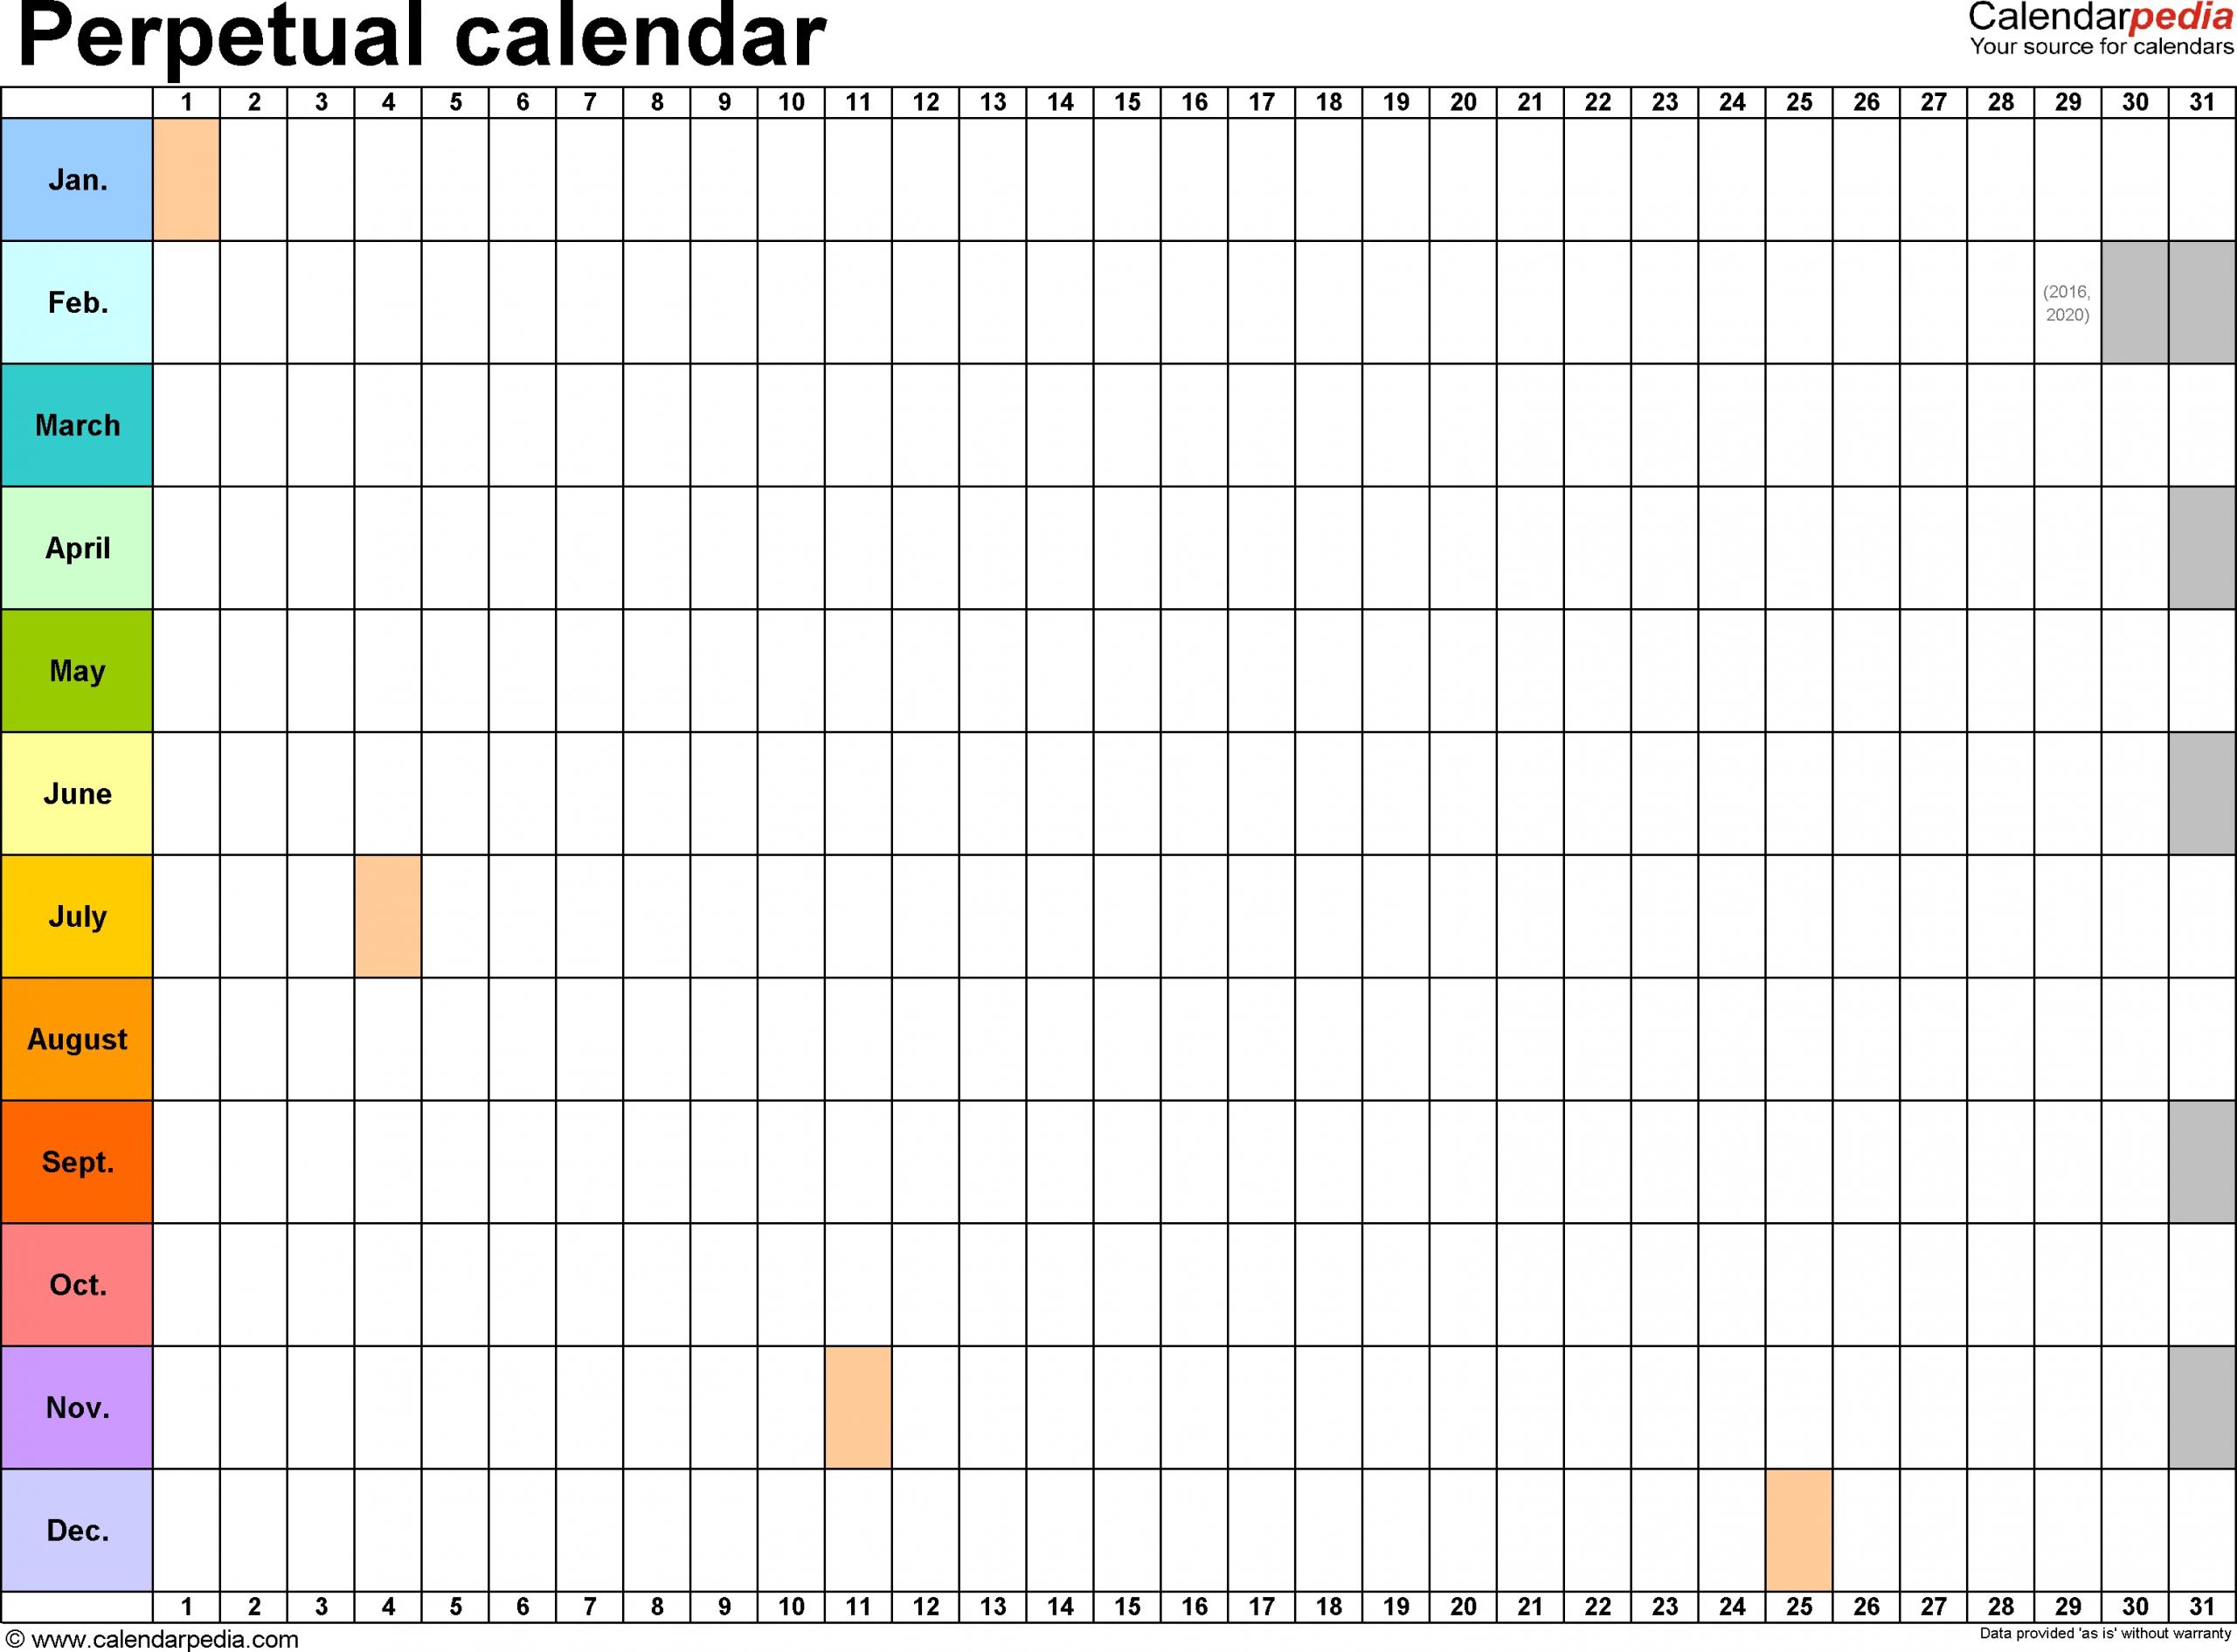 Perpetual Calendars - 7 Free Printable Excel Templates